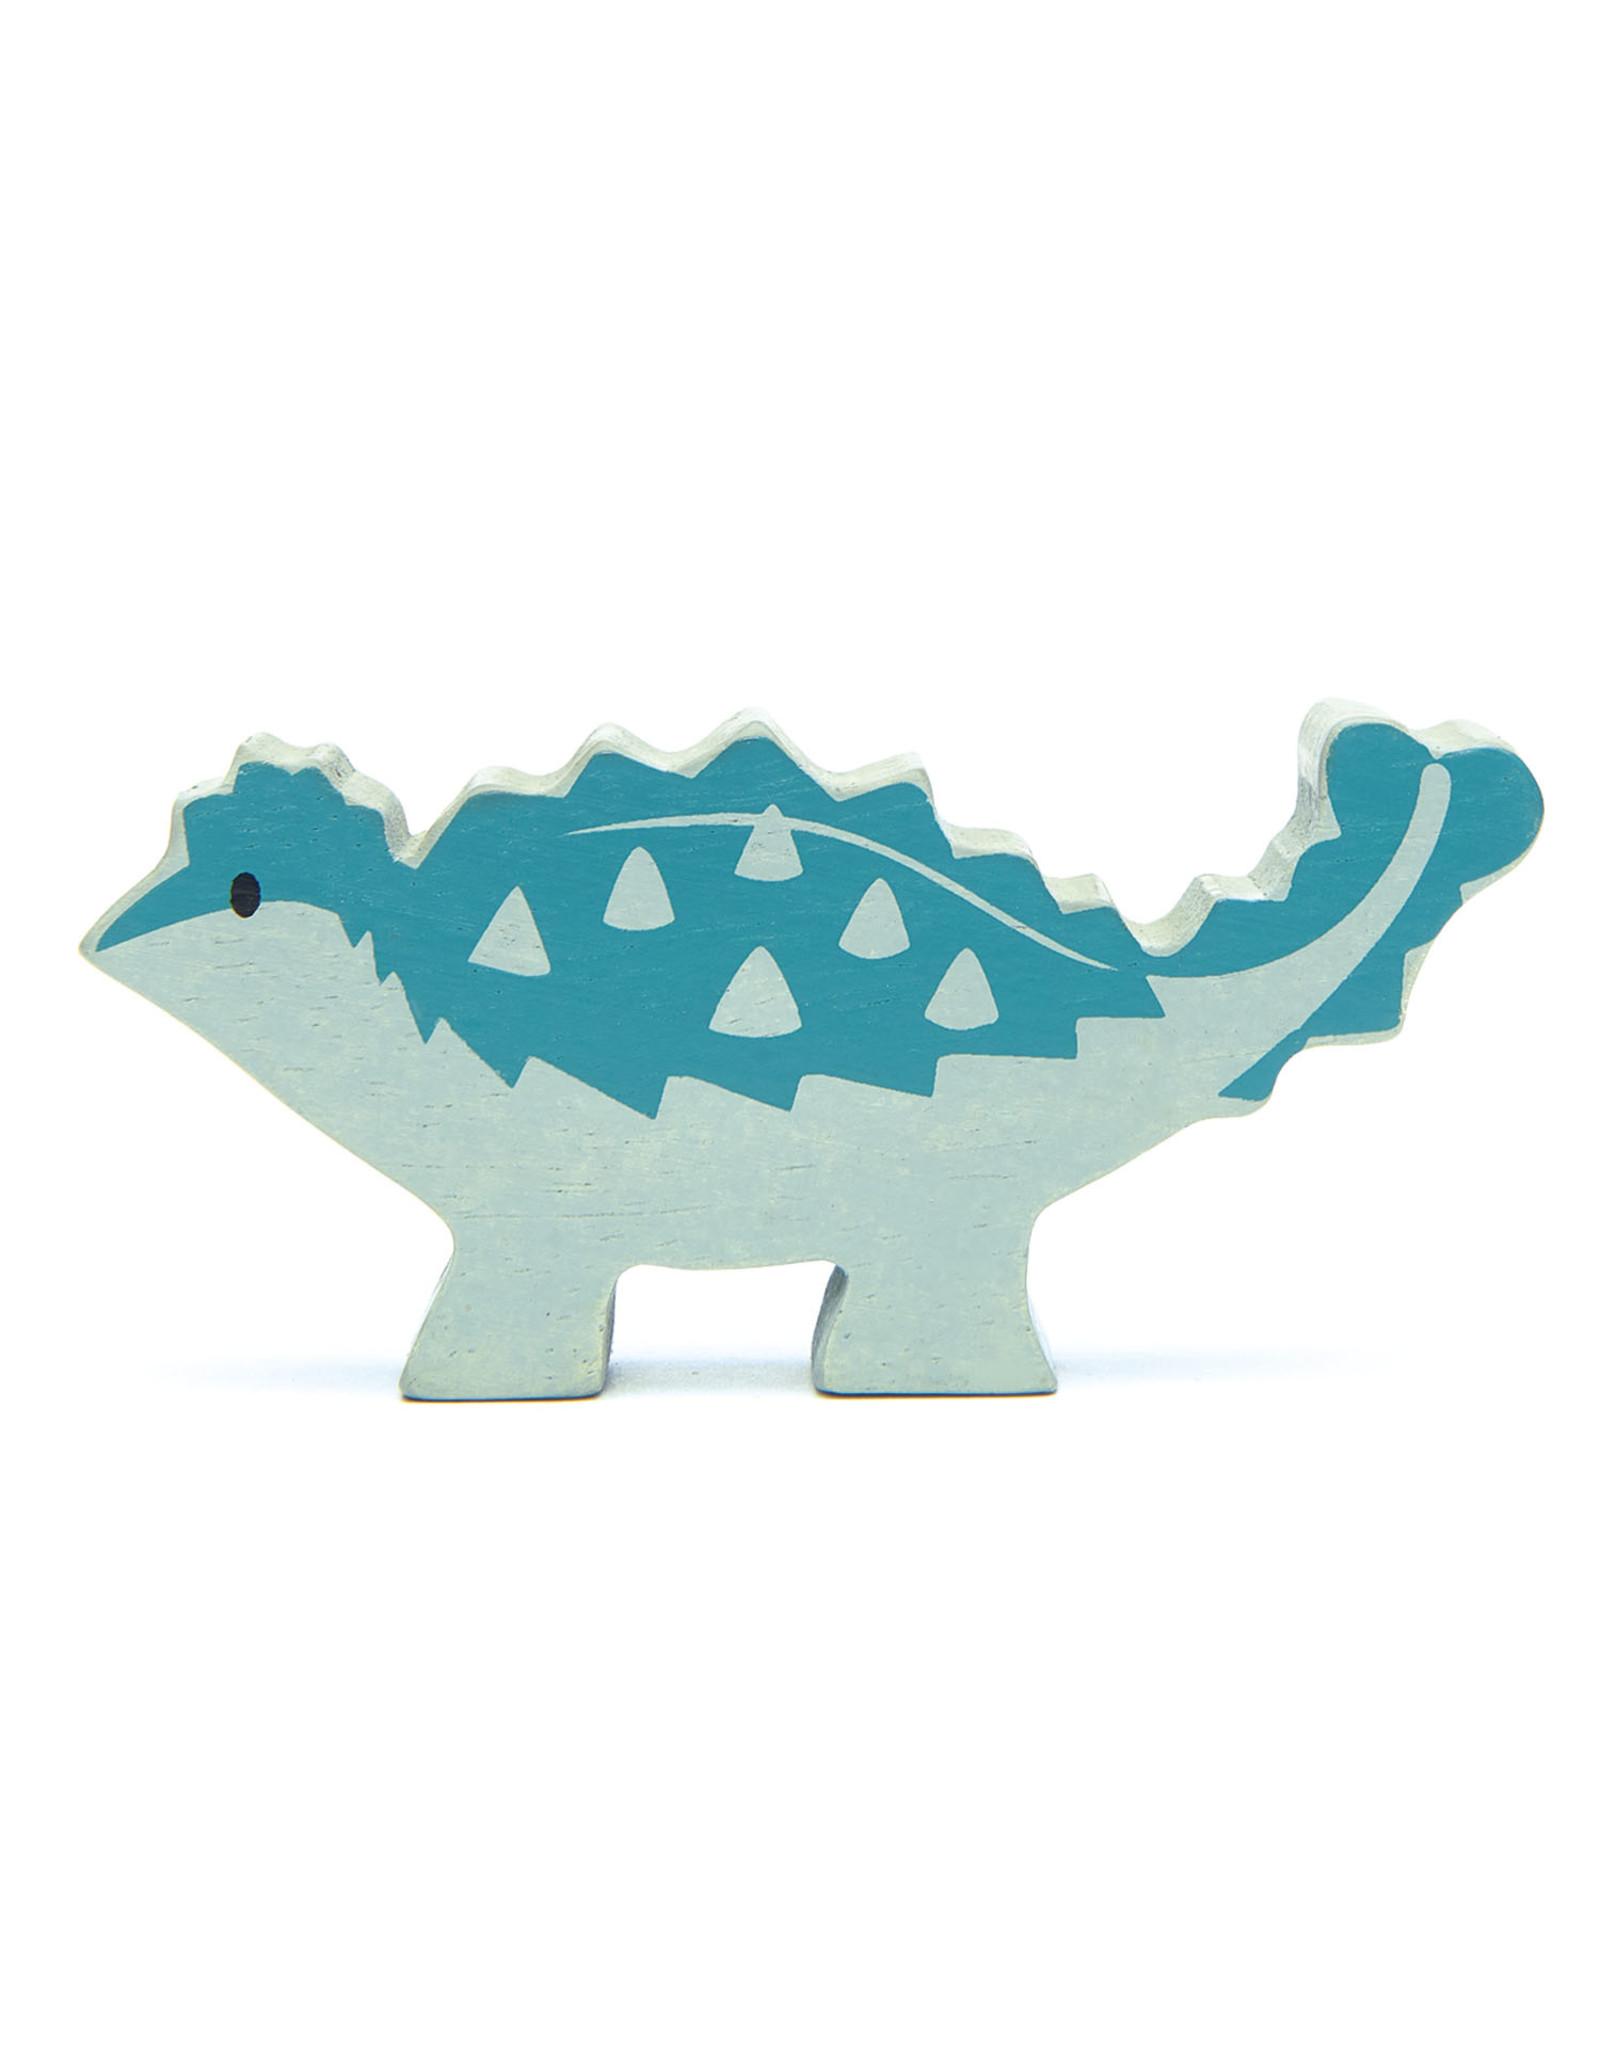 Tender Leaf Toys Dinosaurs - Ankylosaurus